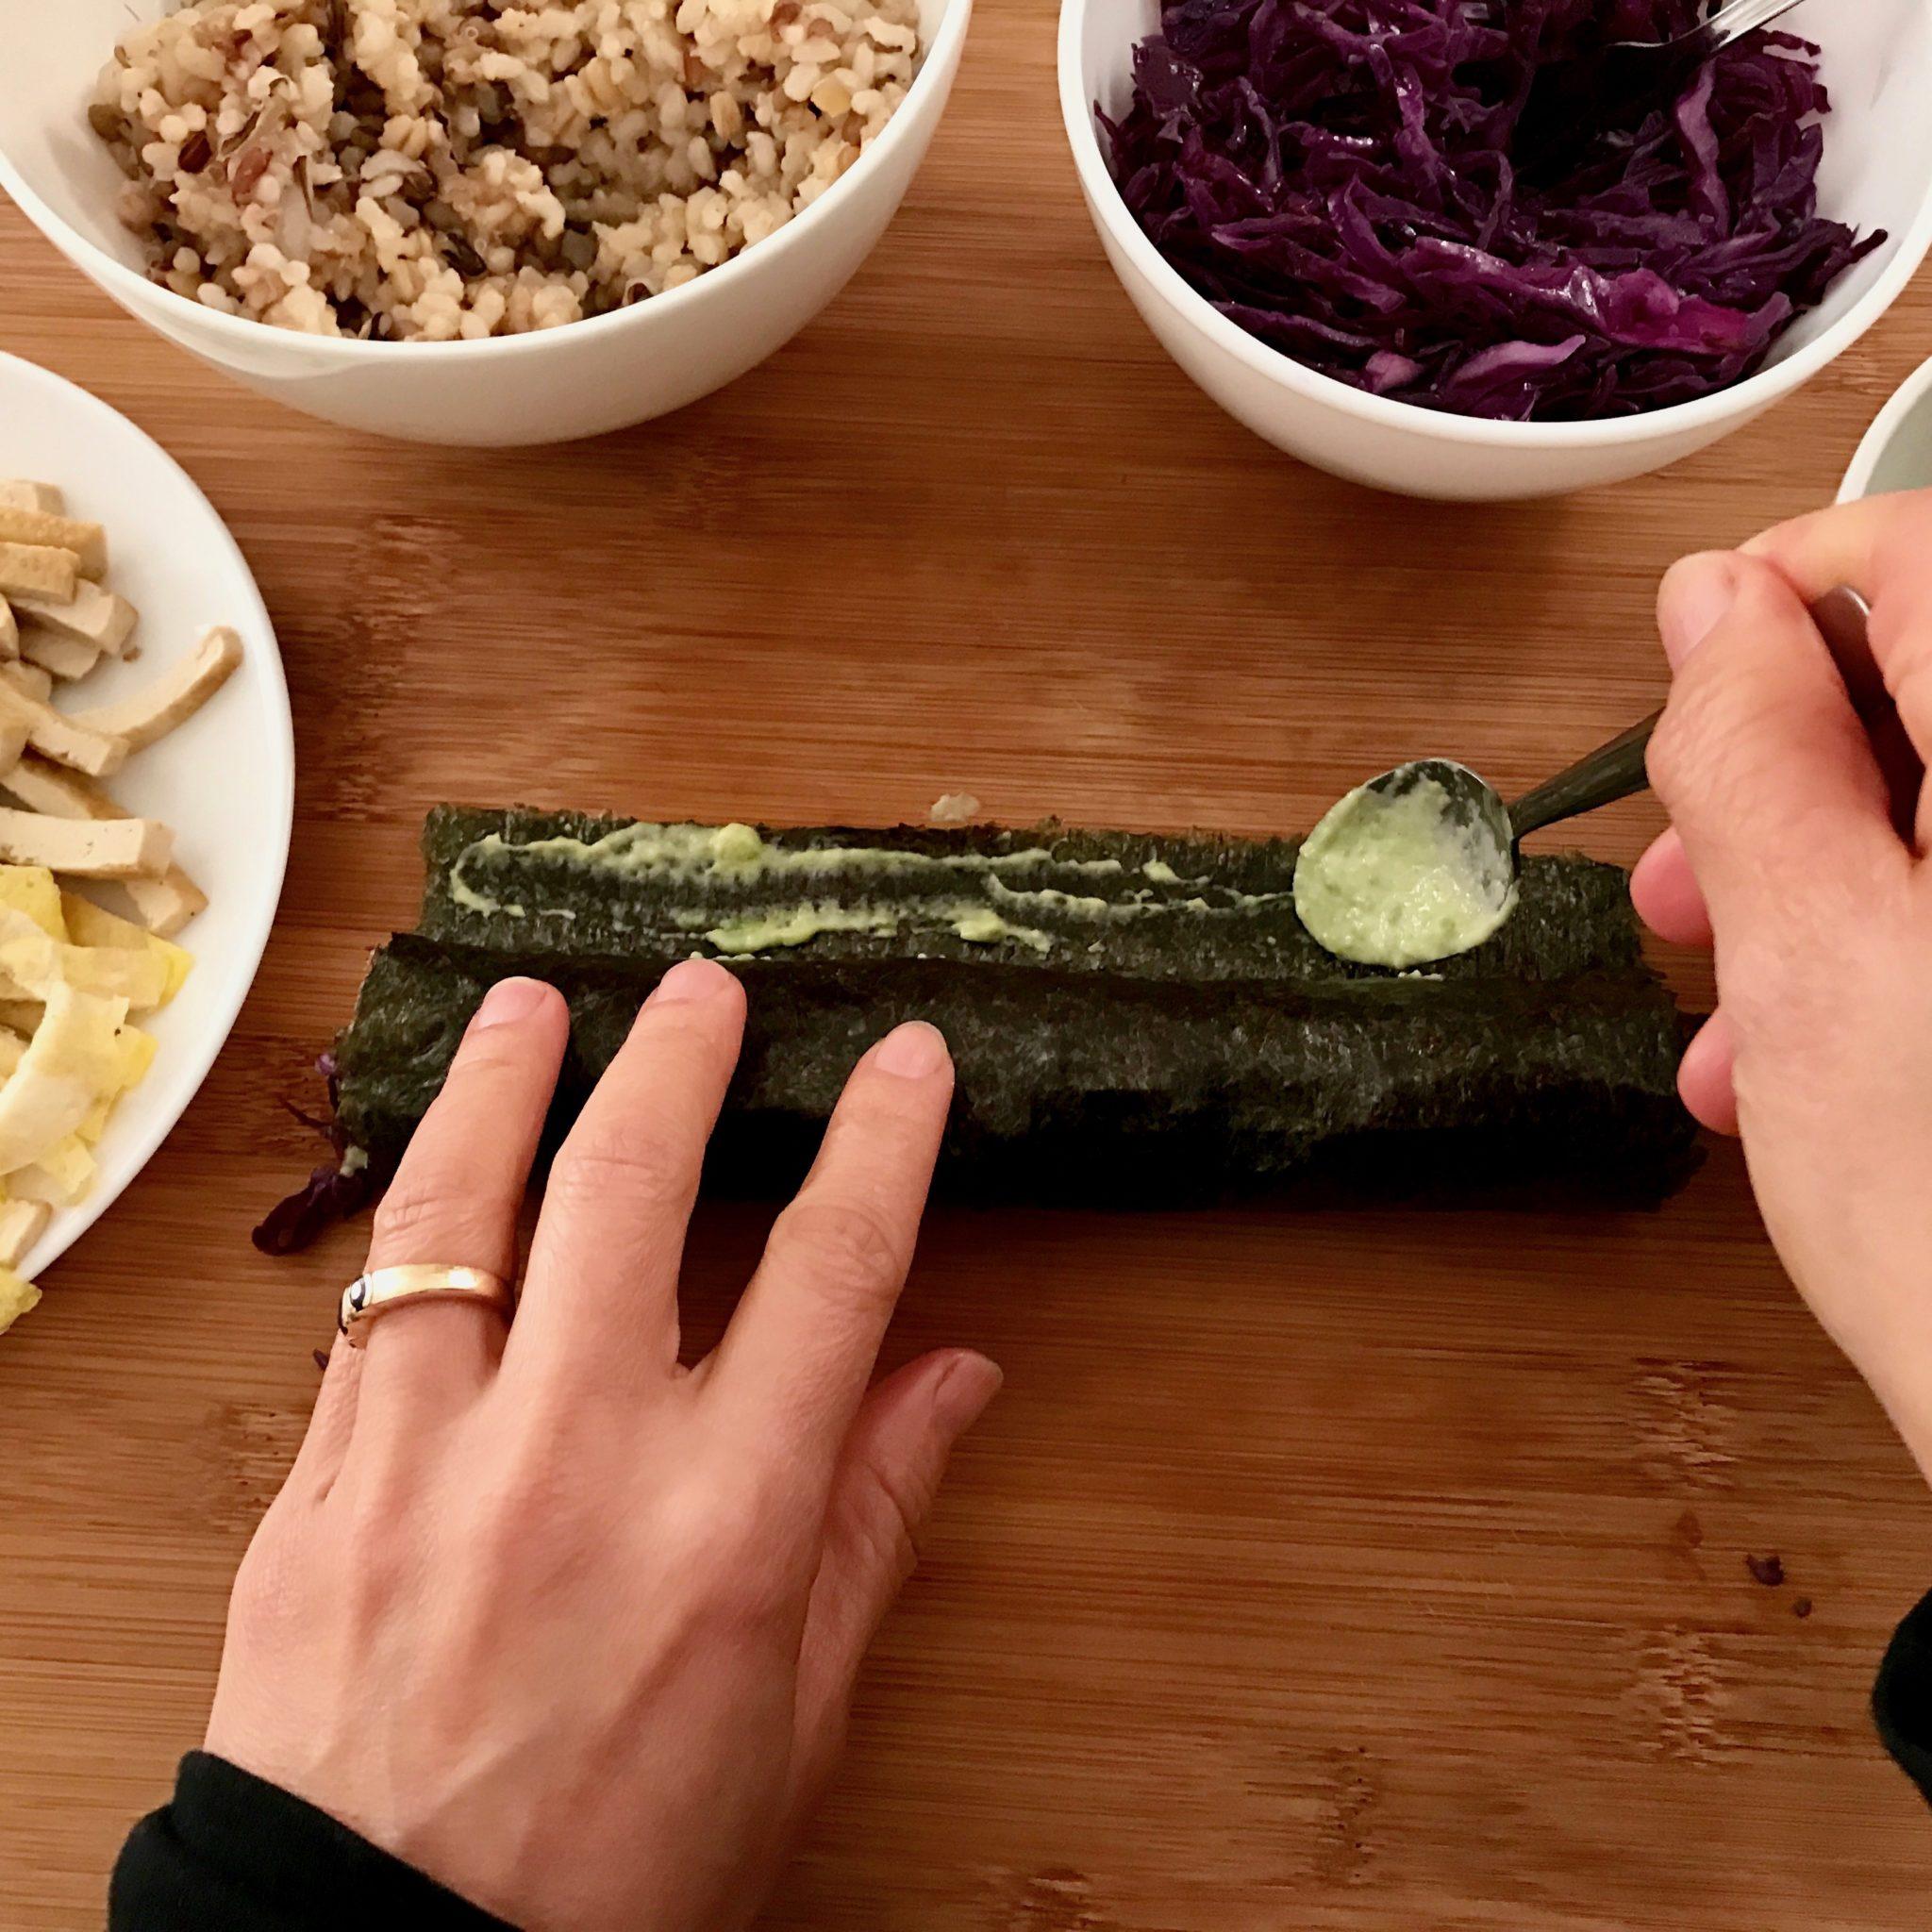 use mayonnaise & avocado paste to glue the seaweed